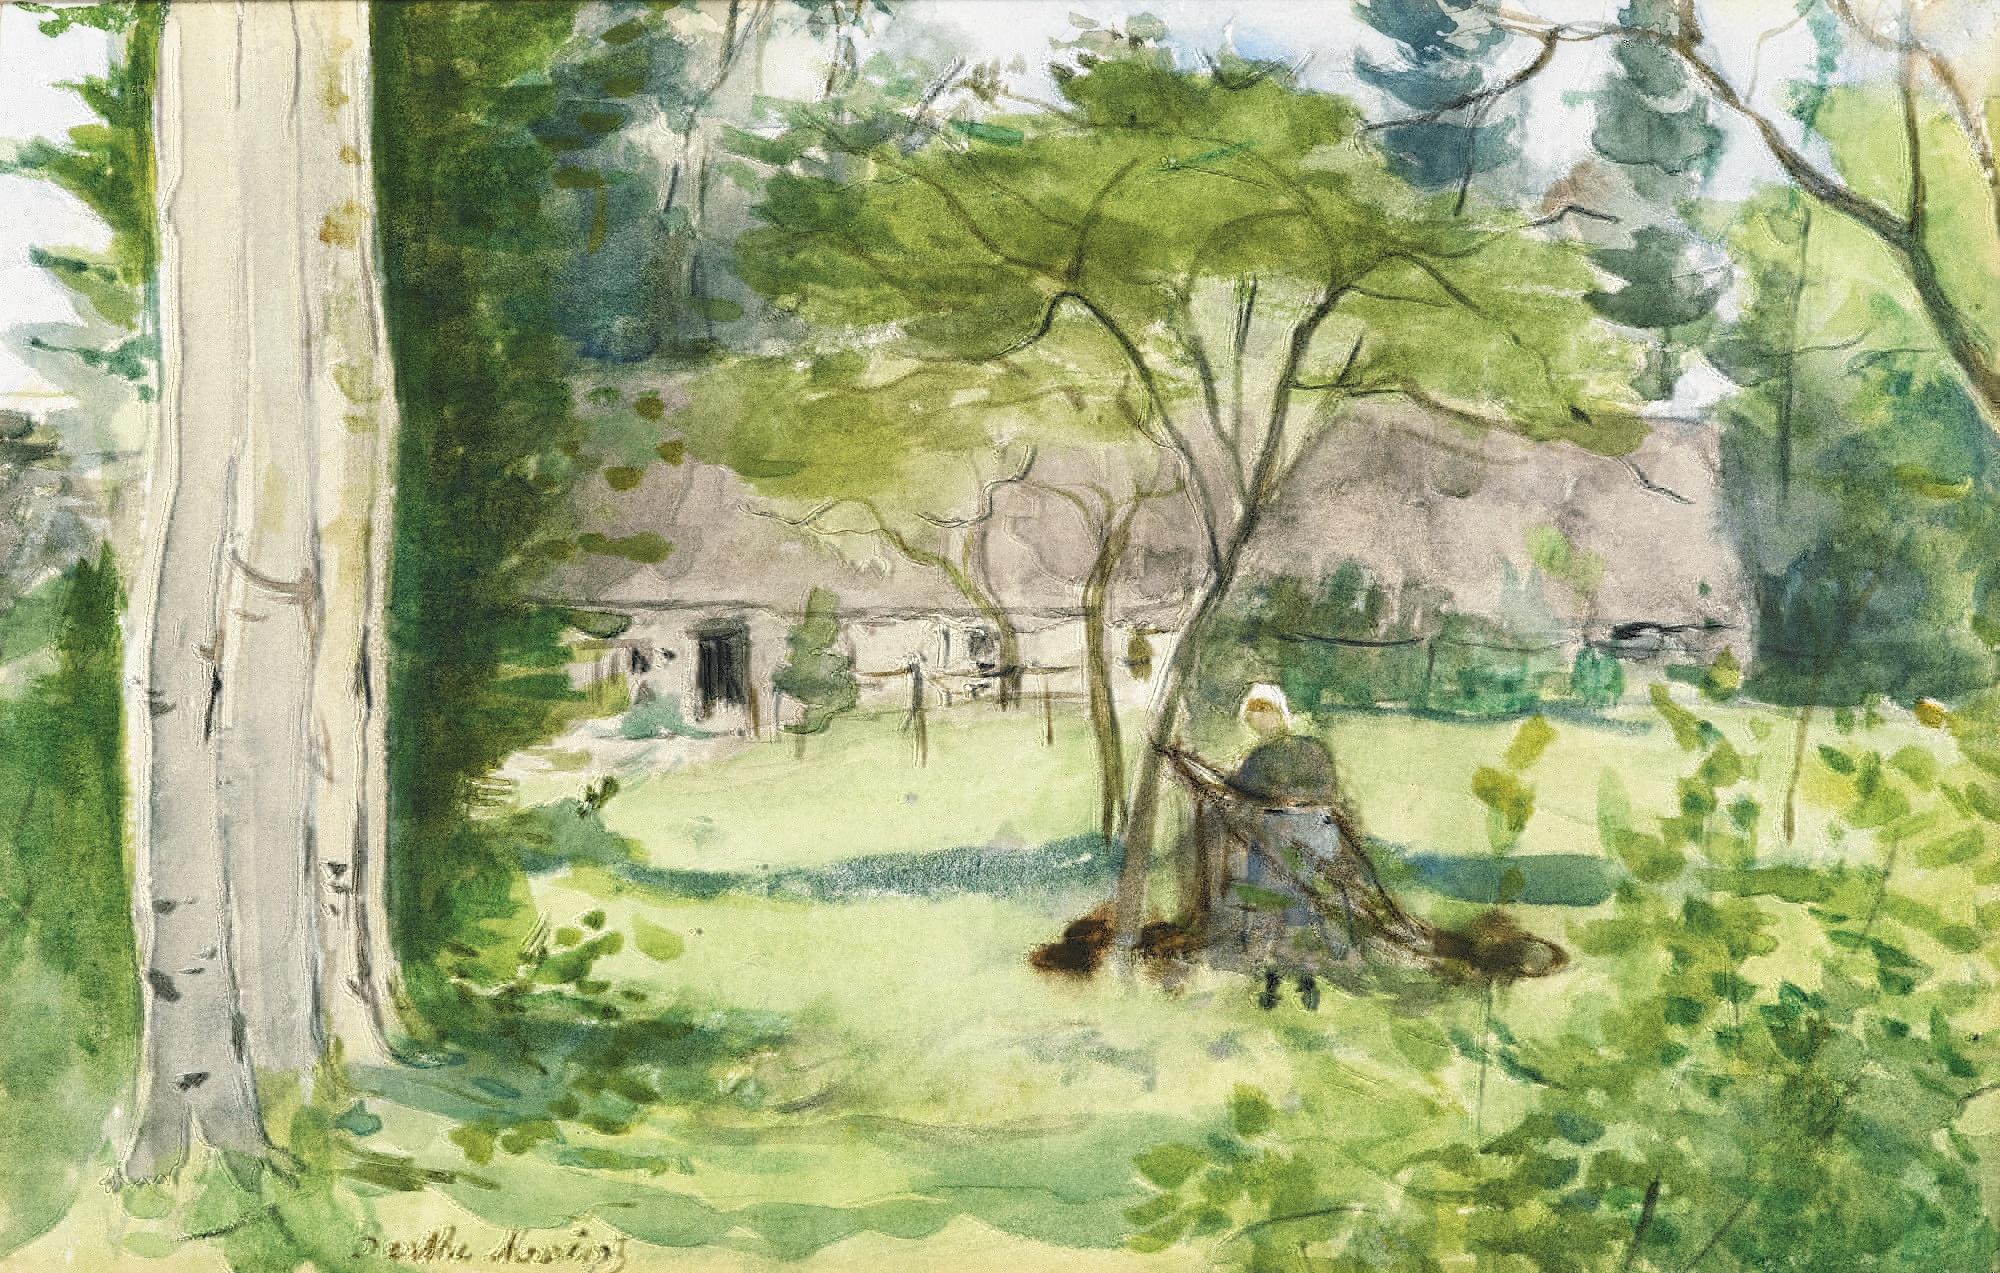 Paysage 2000 pour file:berthe morisot - paysage (watercolour) - wikimedia commons